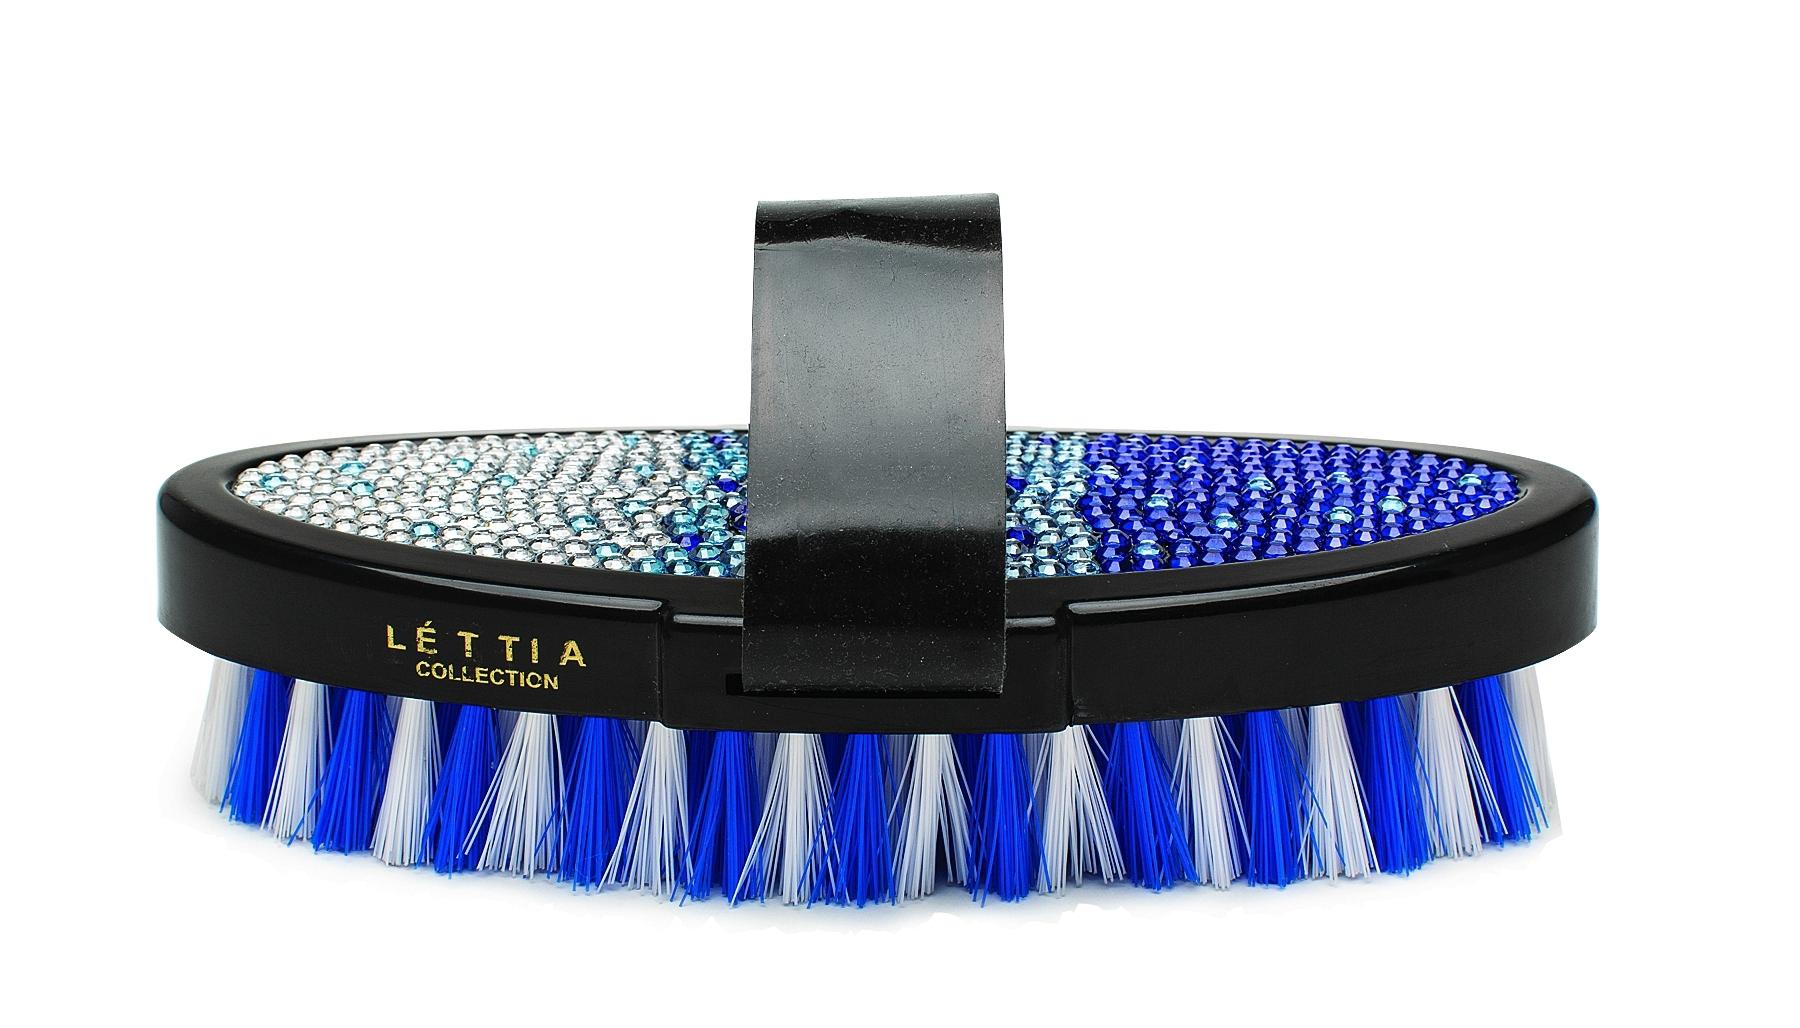 Lettia Blue Crystal Body Brush